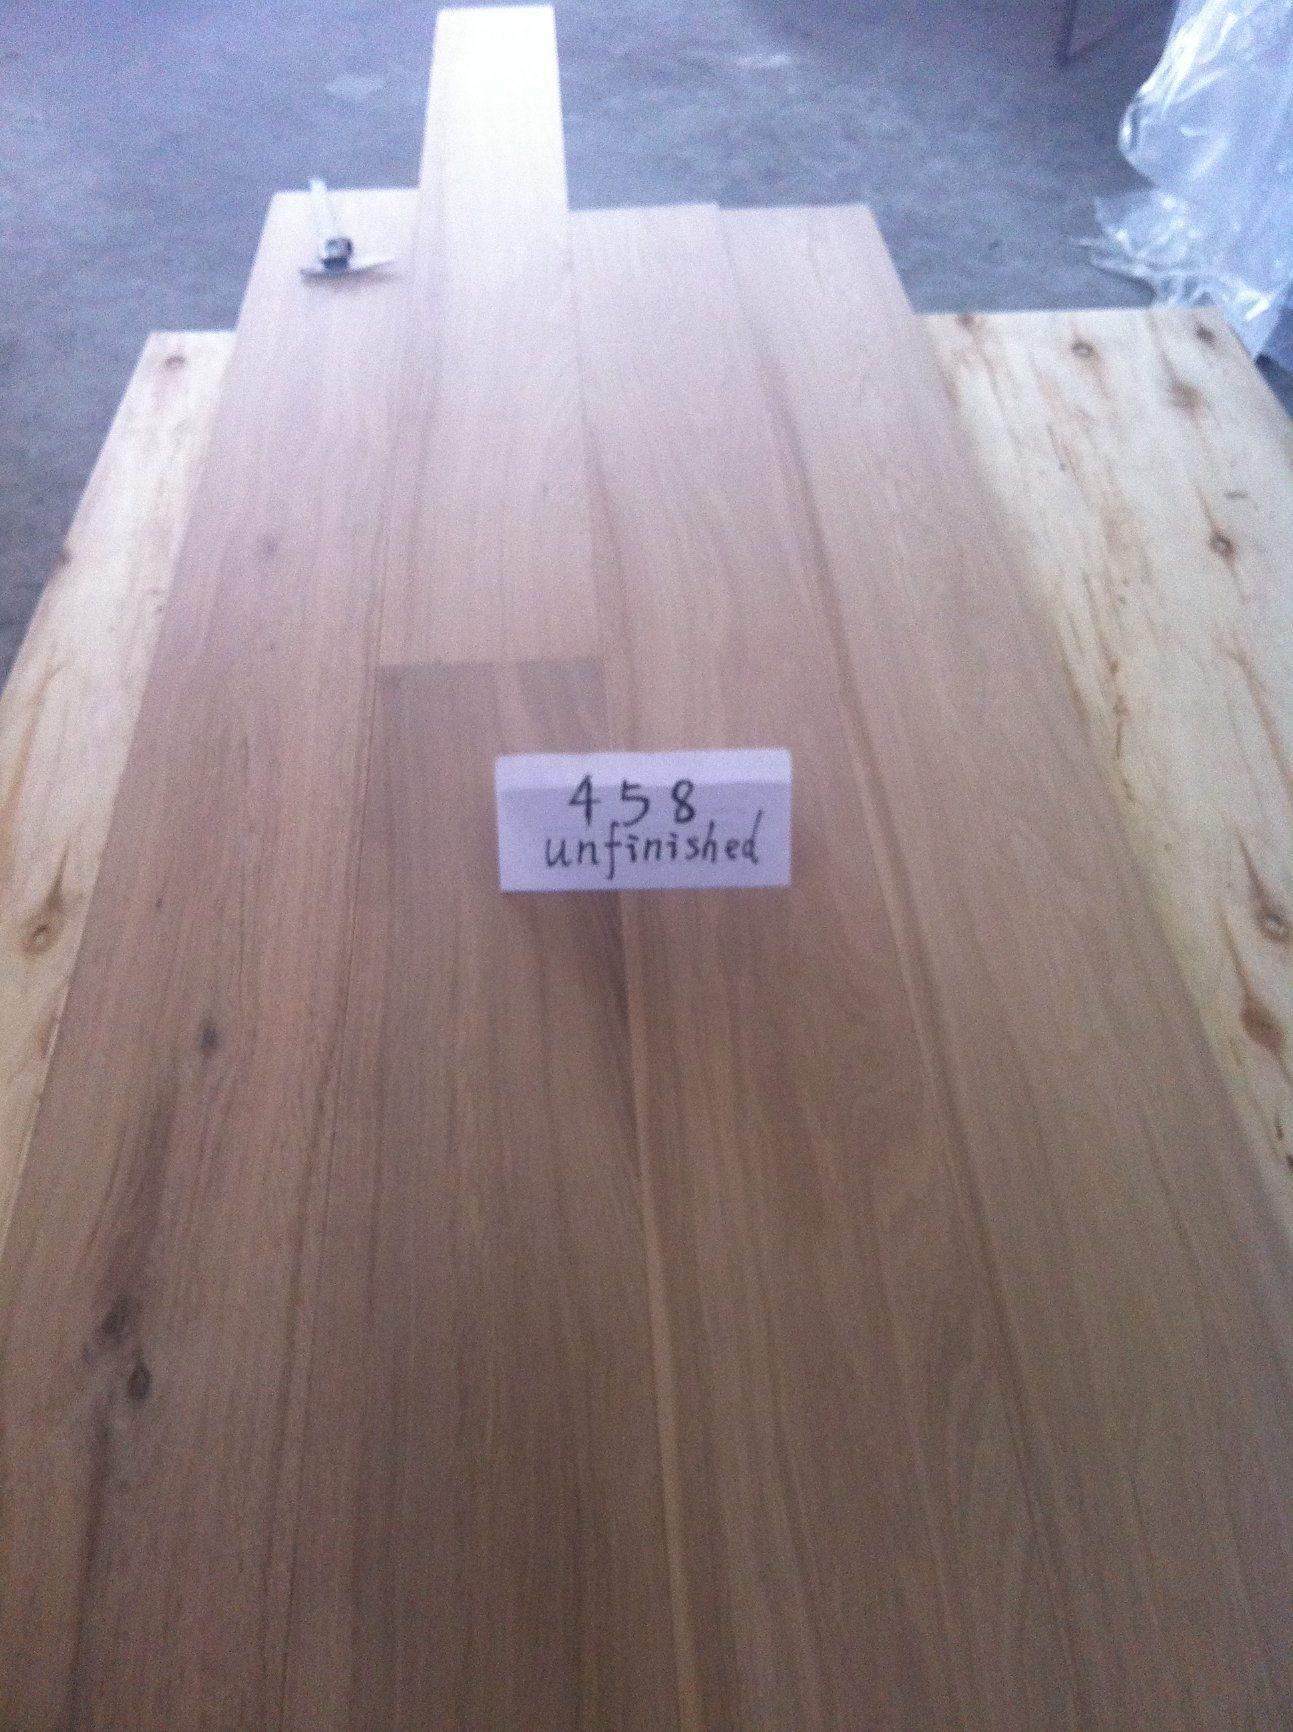 3 Layers T&G Unfinished Oak Parquet Flooring